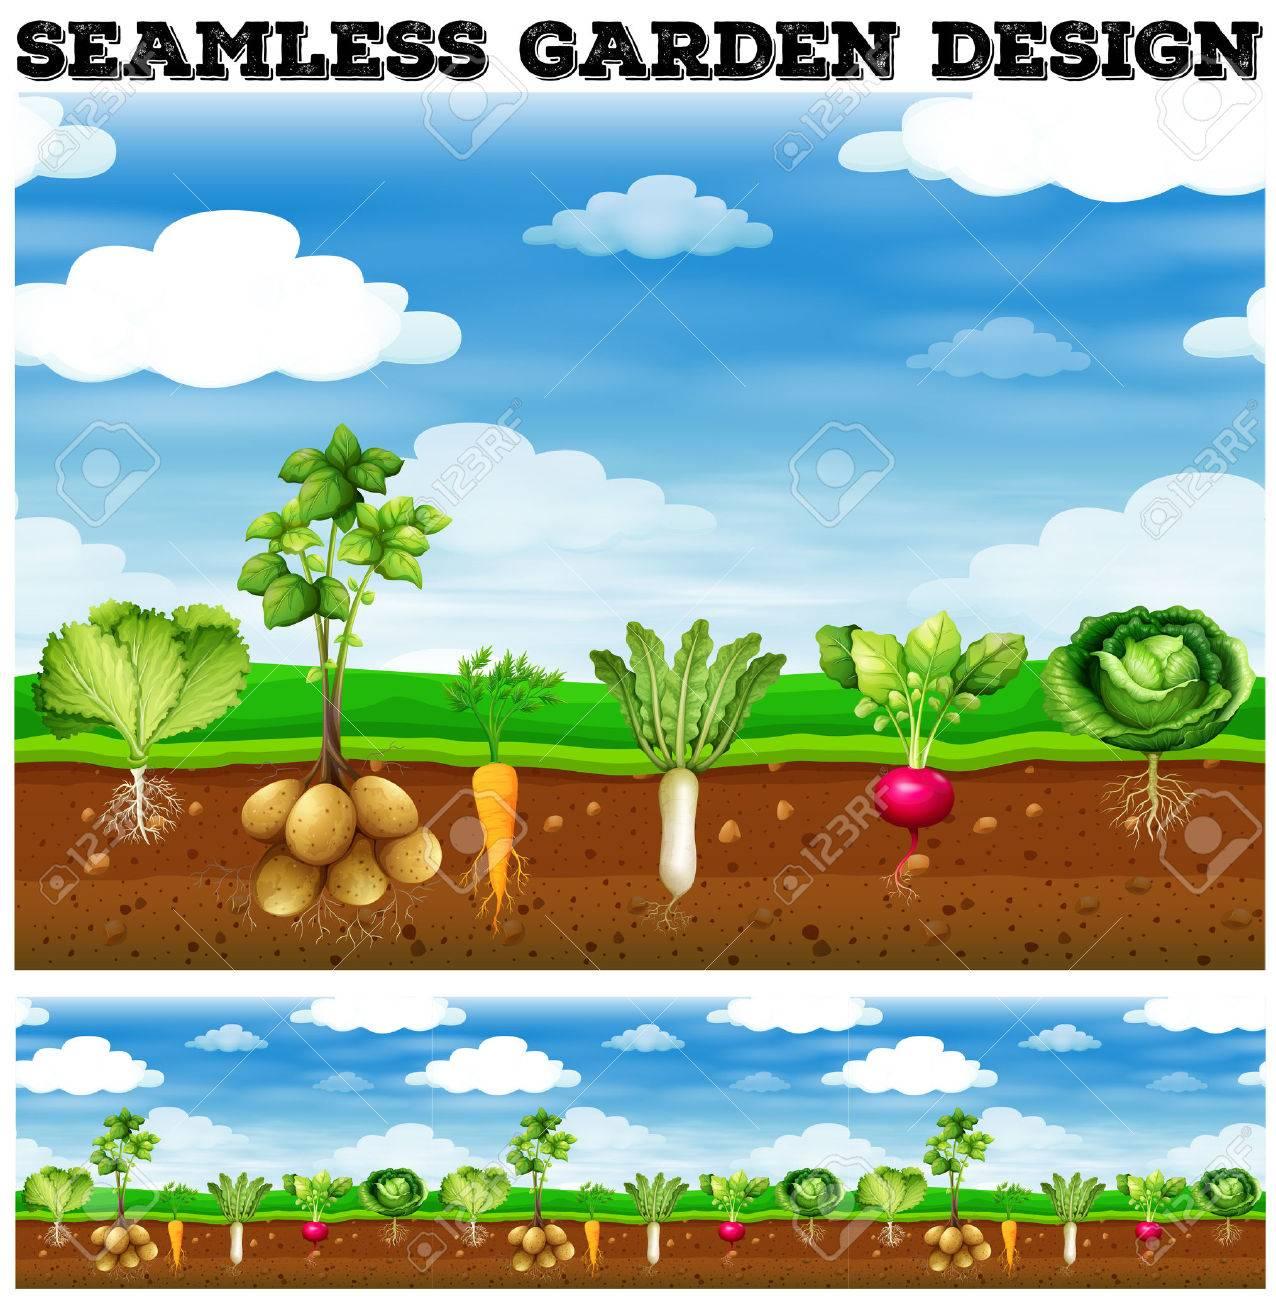 Different kind of vegetables in the garden illustration - 50176569